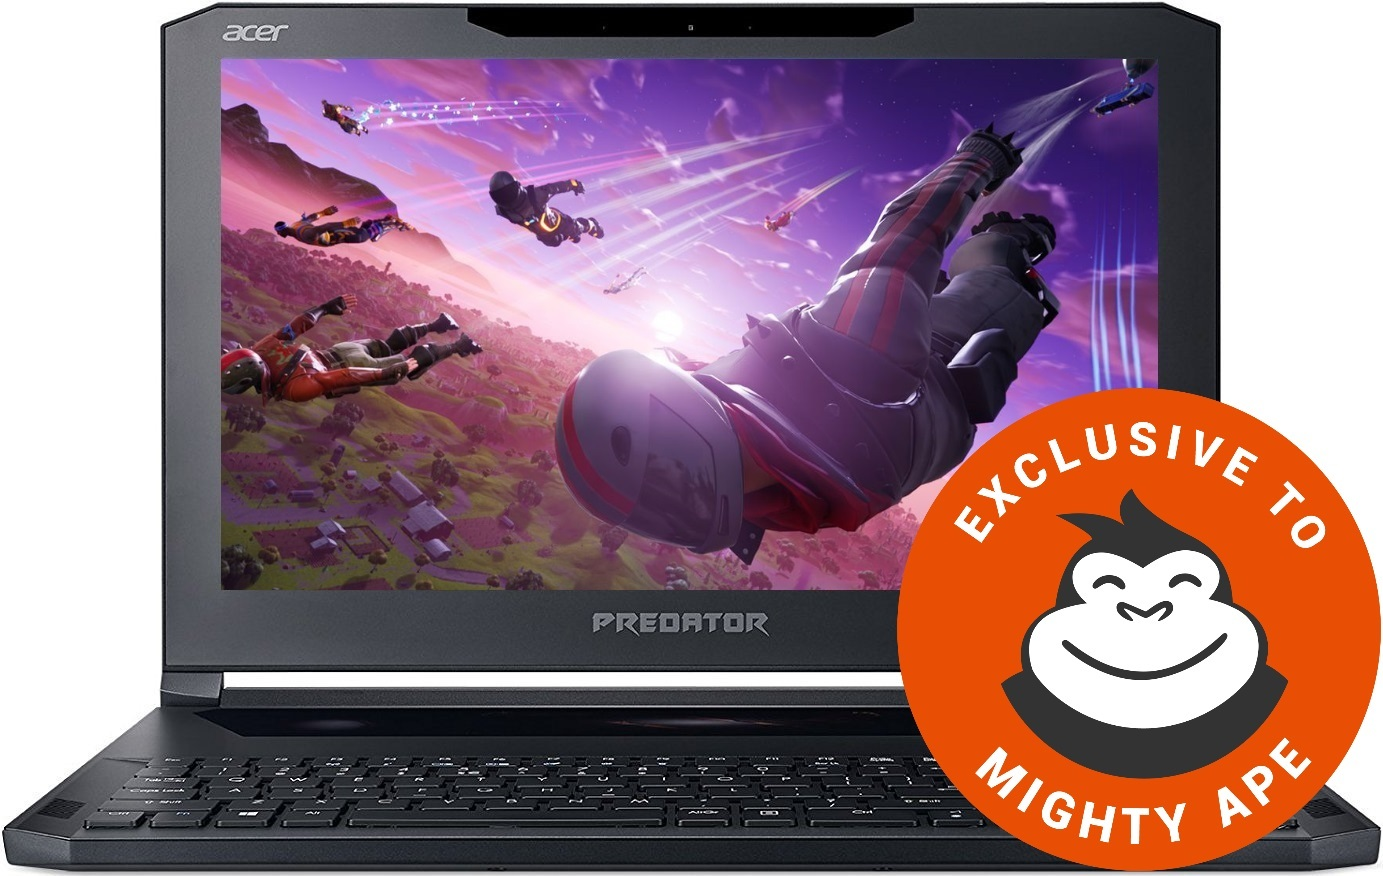 "Acer Predator Triton 700 15.6"" Gaming Laptop | Intel Core i7 | 32GB RAM | GTX 1080 8GB image"